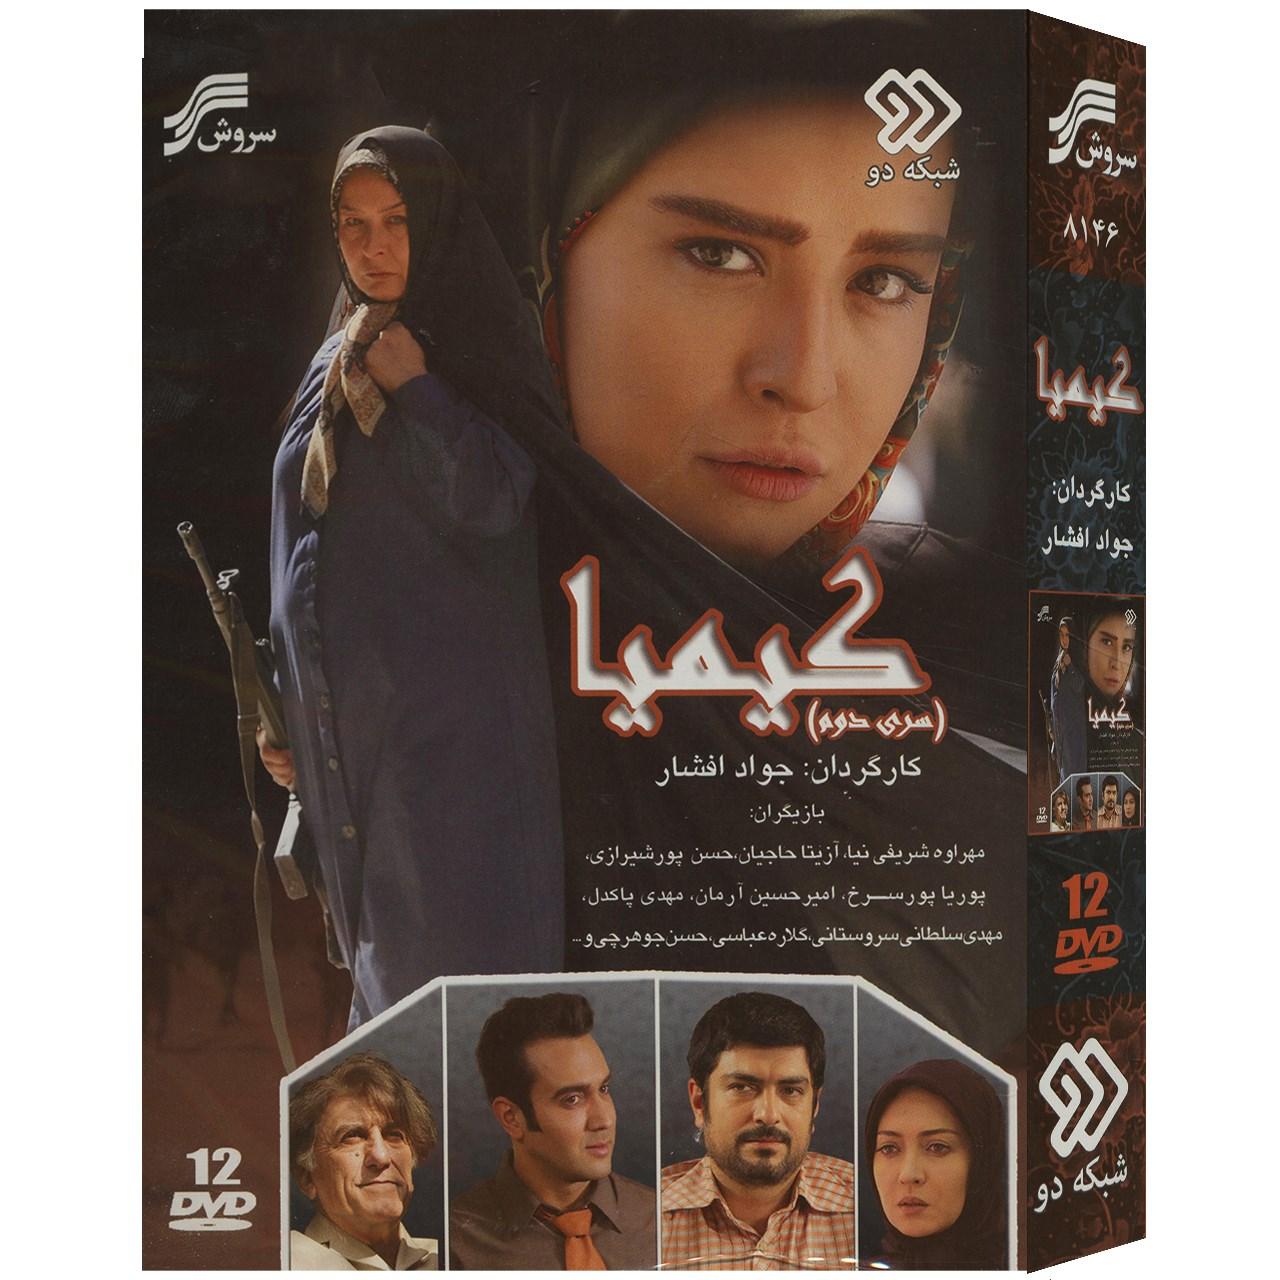 سریال تلویزیونی کیمیا 2 اثر جواد افشار